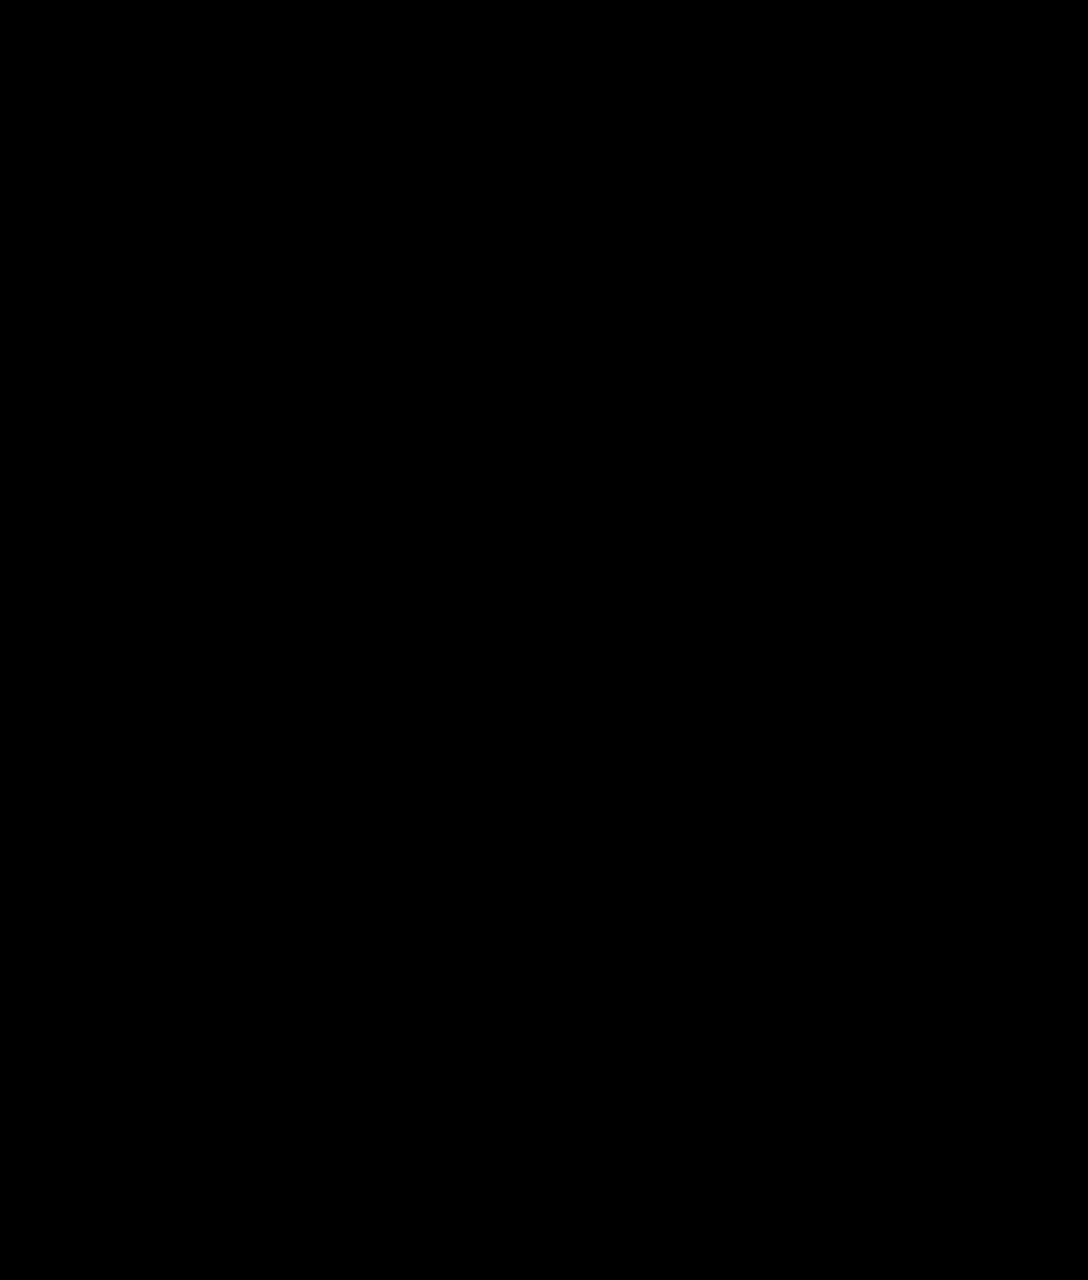 Icone Linkedin noir et blanc